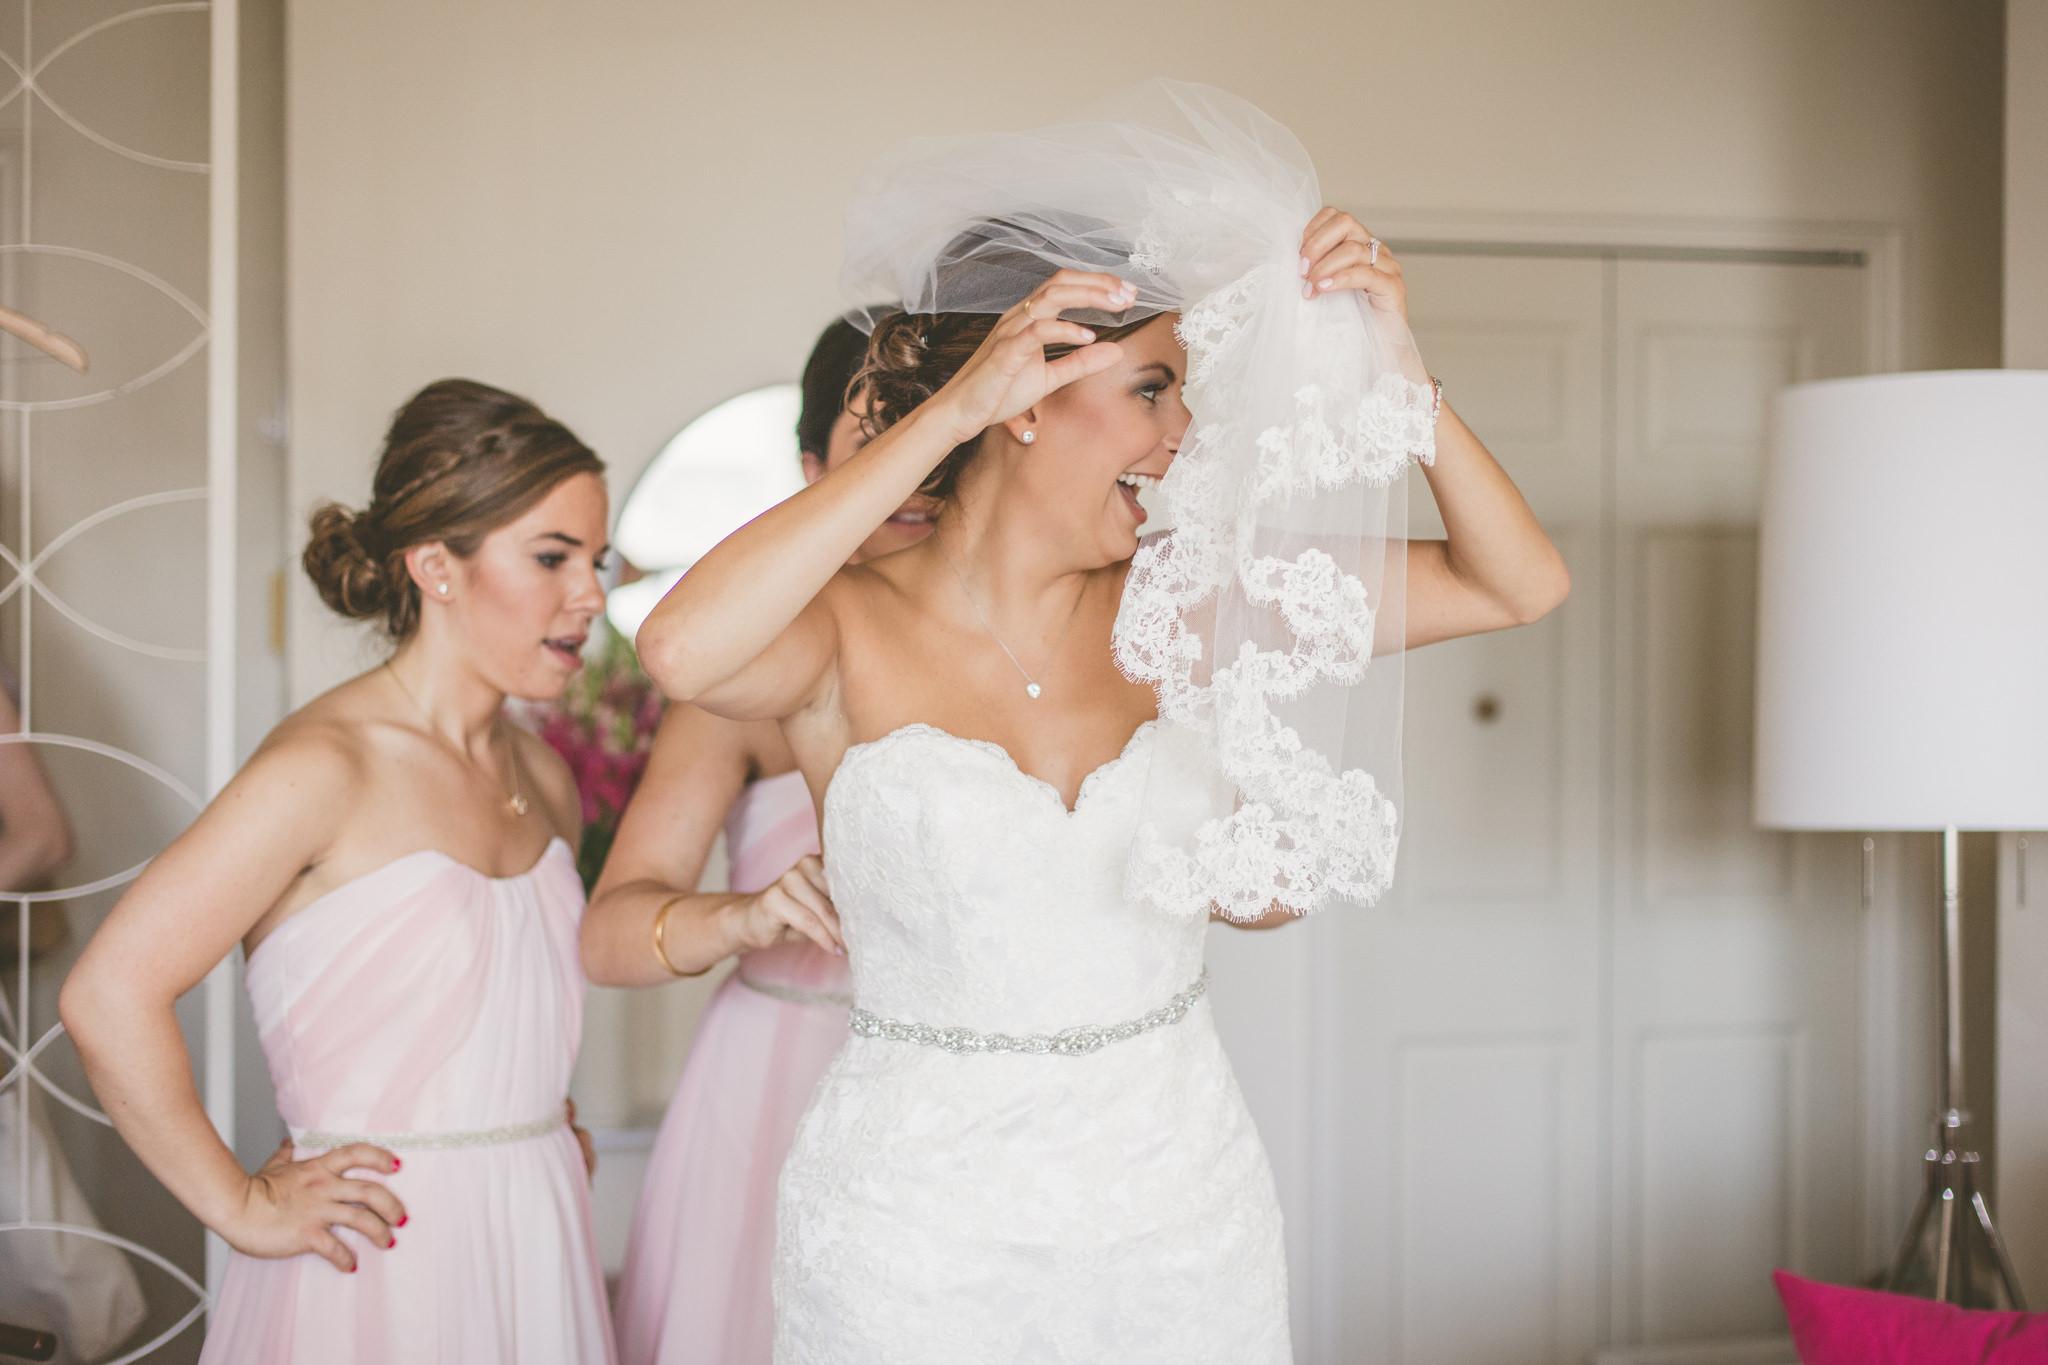 mclean house wedding photos 115 - McLean House Wedding Part 1